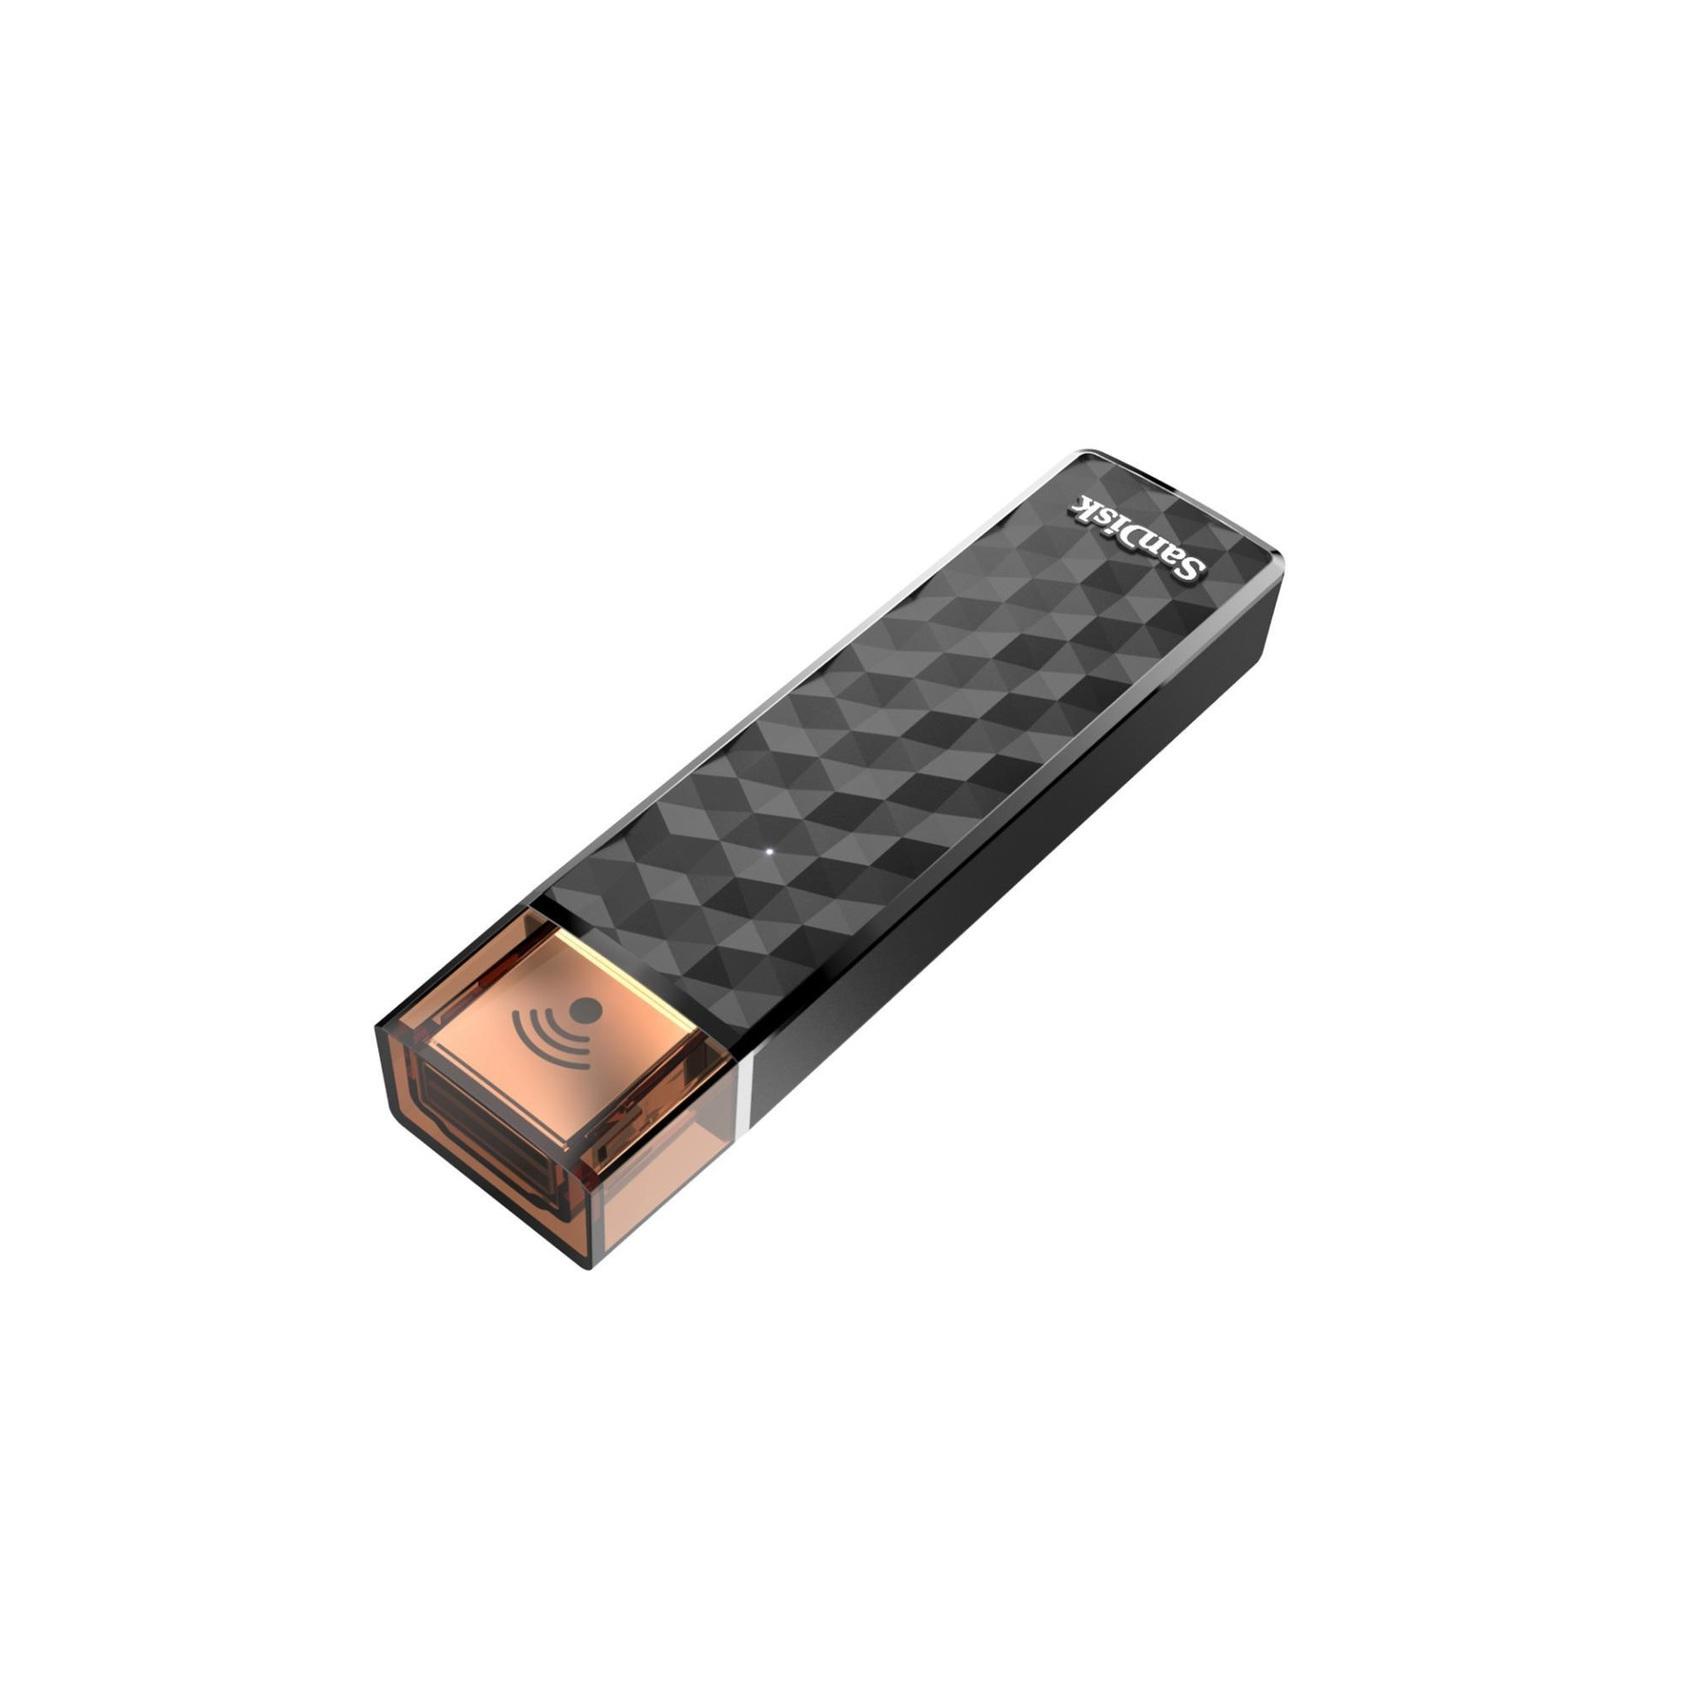 SANDISK USB WIRELESS FLASH 128GB